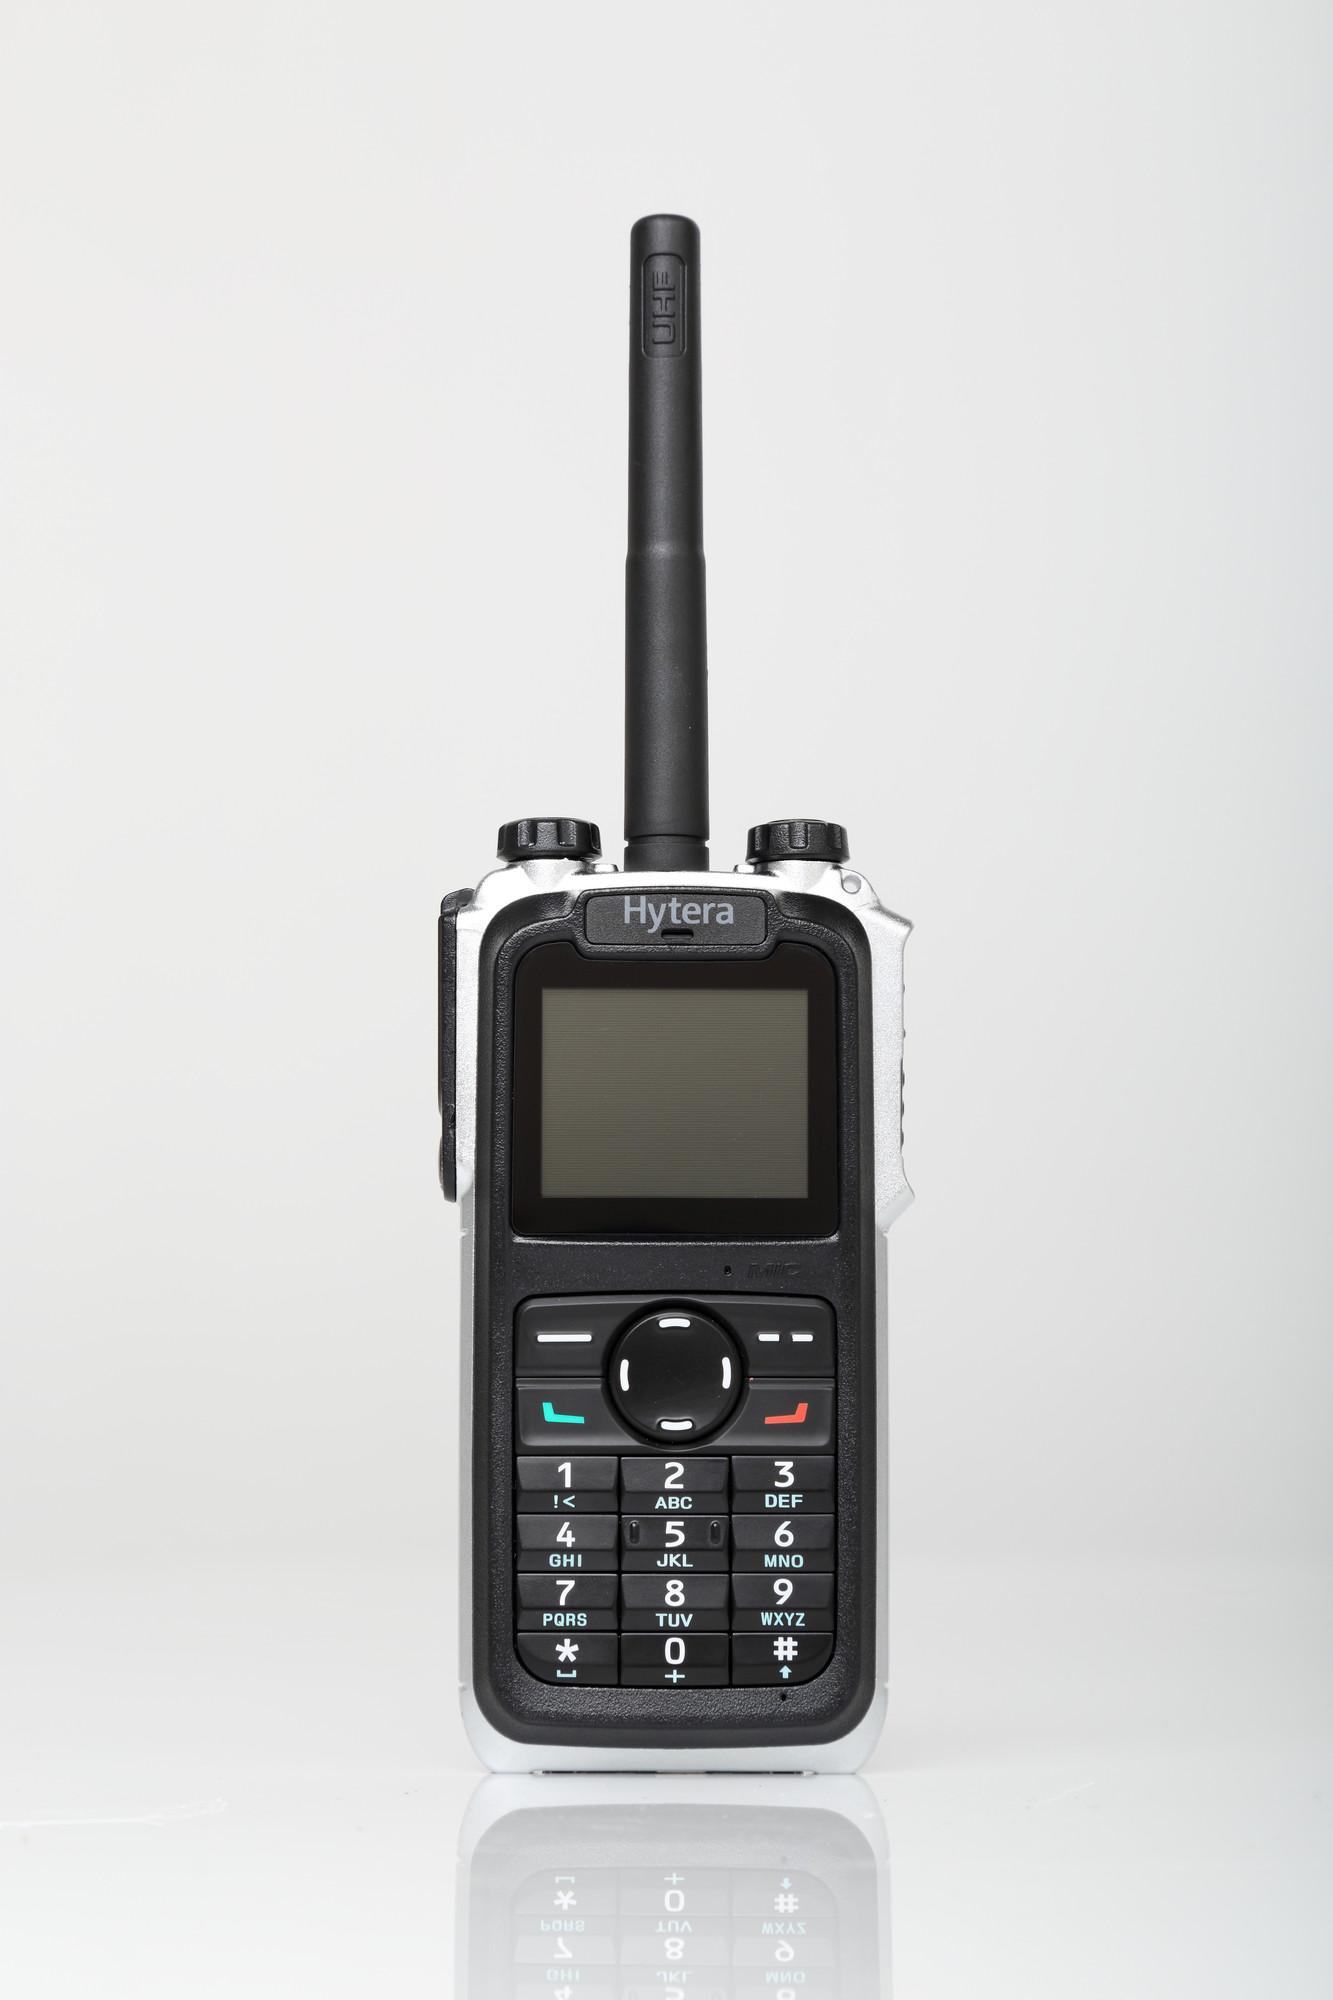 TETRA radiostanice Hytera Z1p